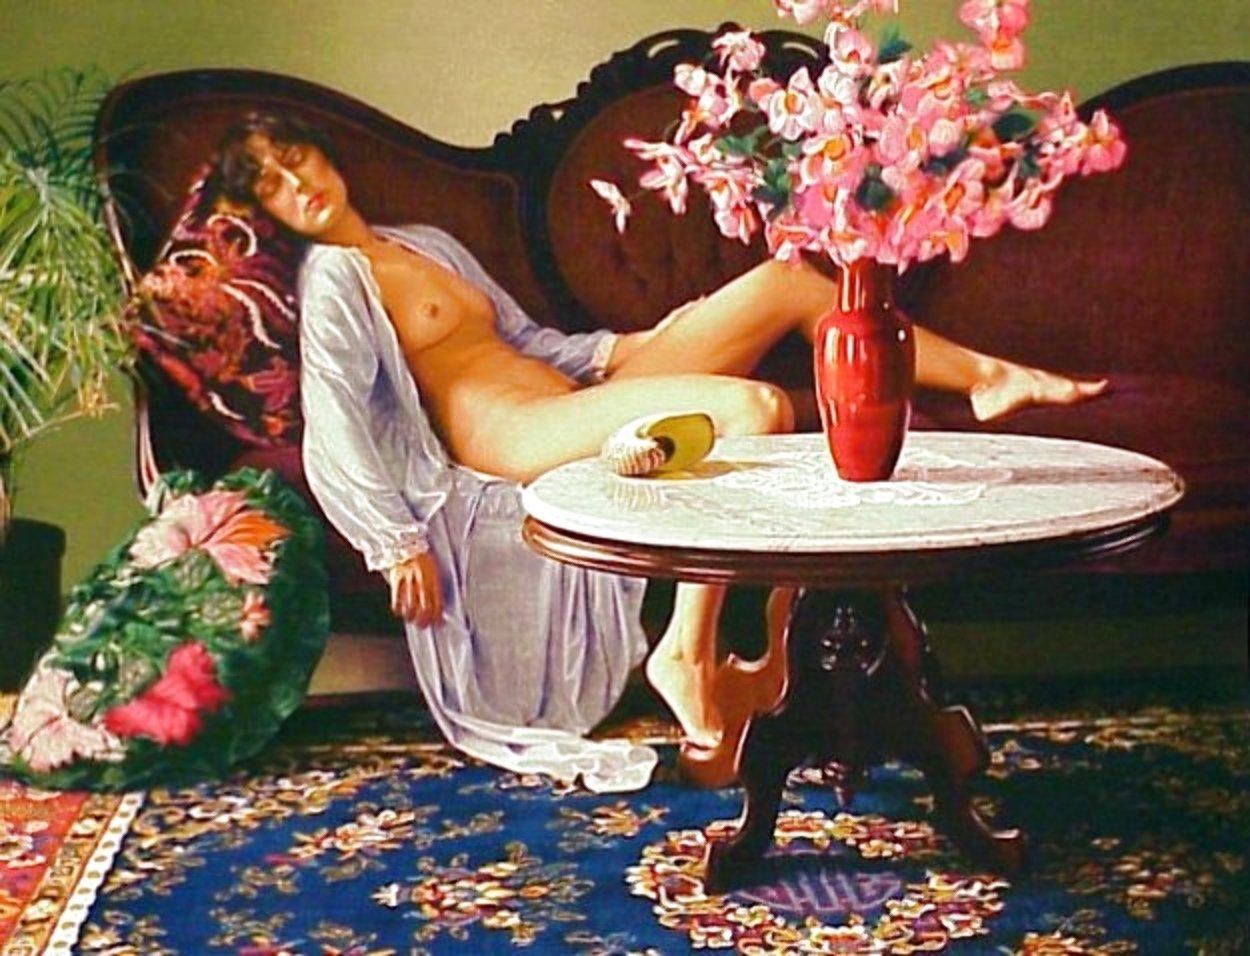 Jessica 1983 Huge Limited Edition Print by Douglas Hofmann